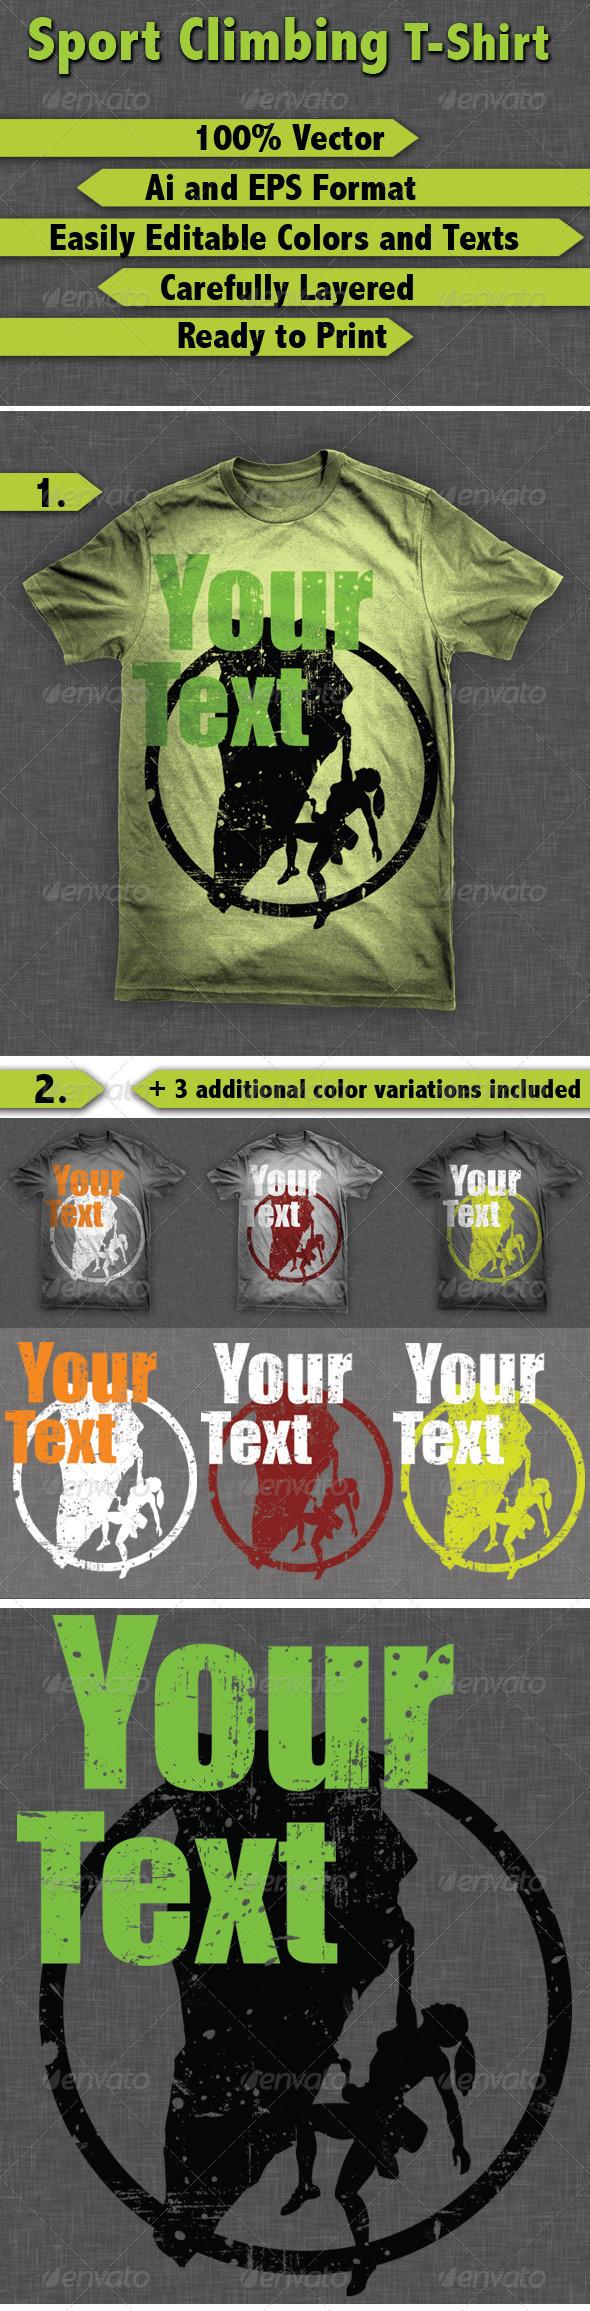 GraphicRiver Sport Climbing T-Shirt 8205239